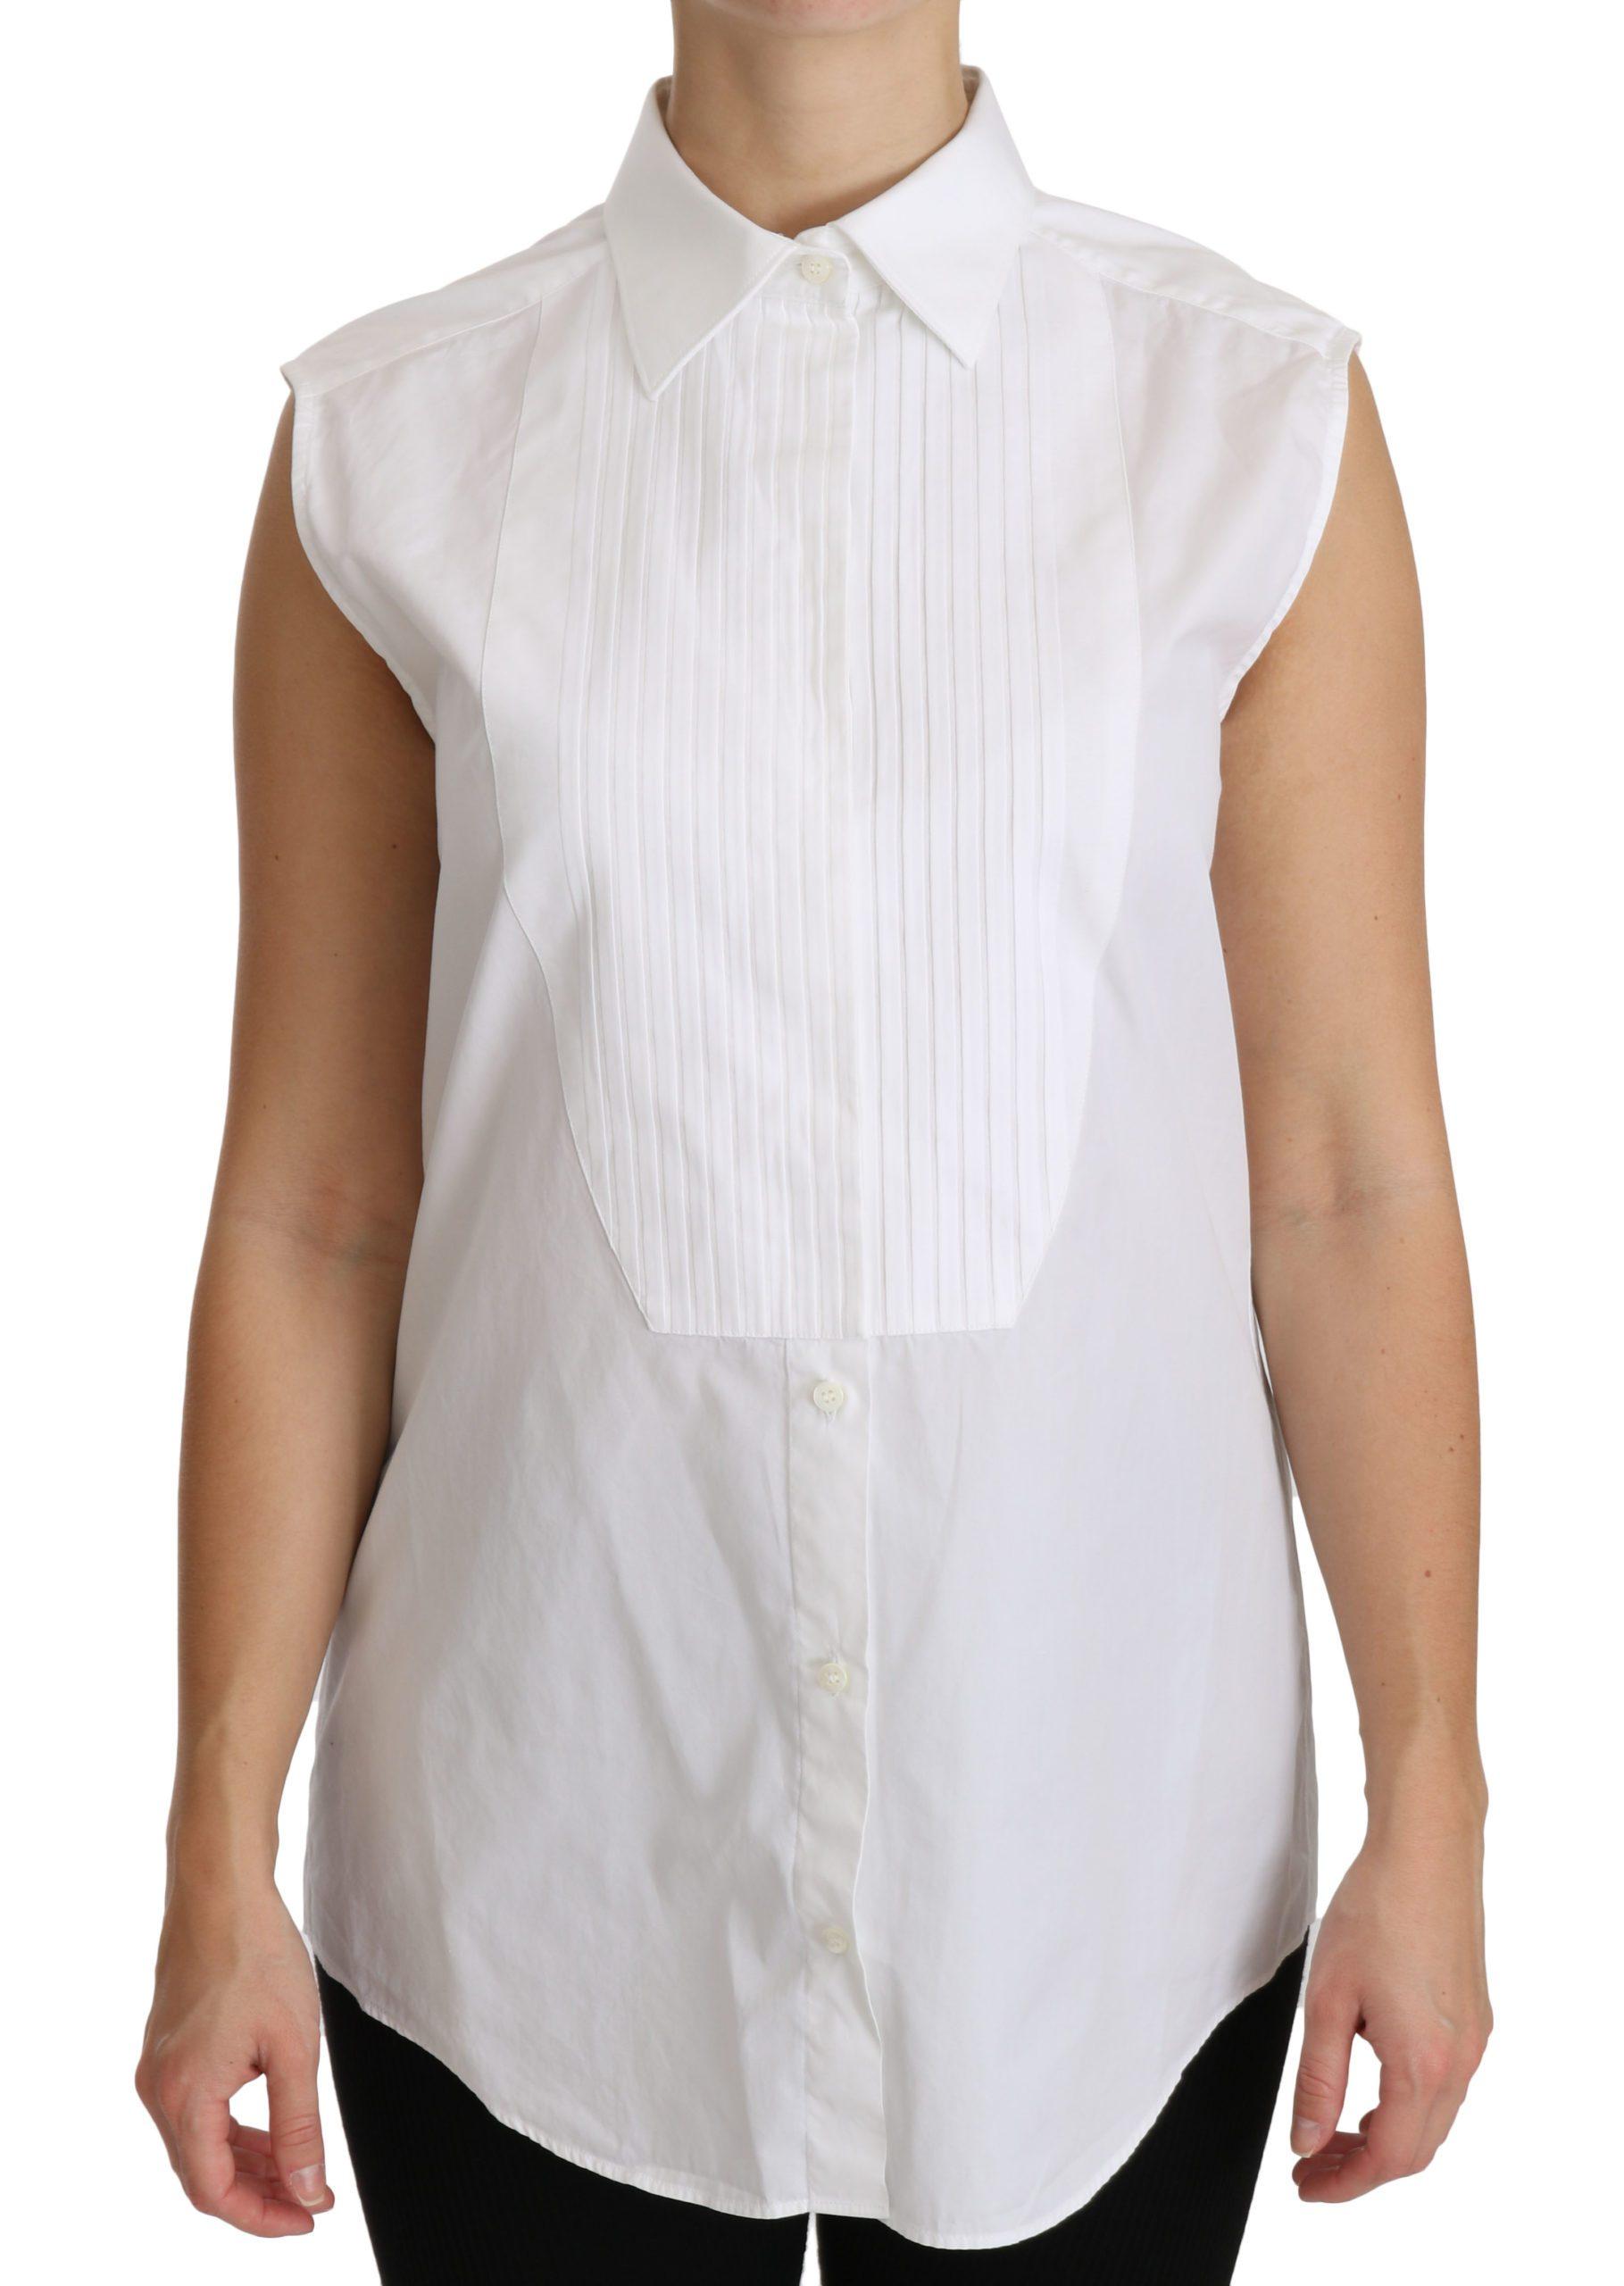 Dolce & Gabbana Women's Collared Sleeveless Polo Shirt White TSH4317 - IT44 L